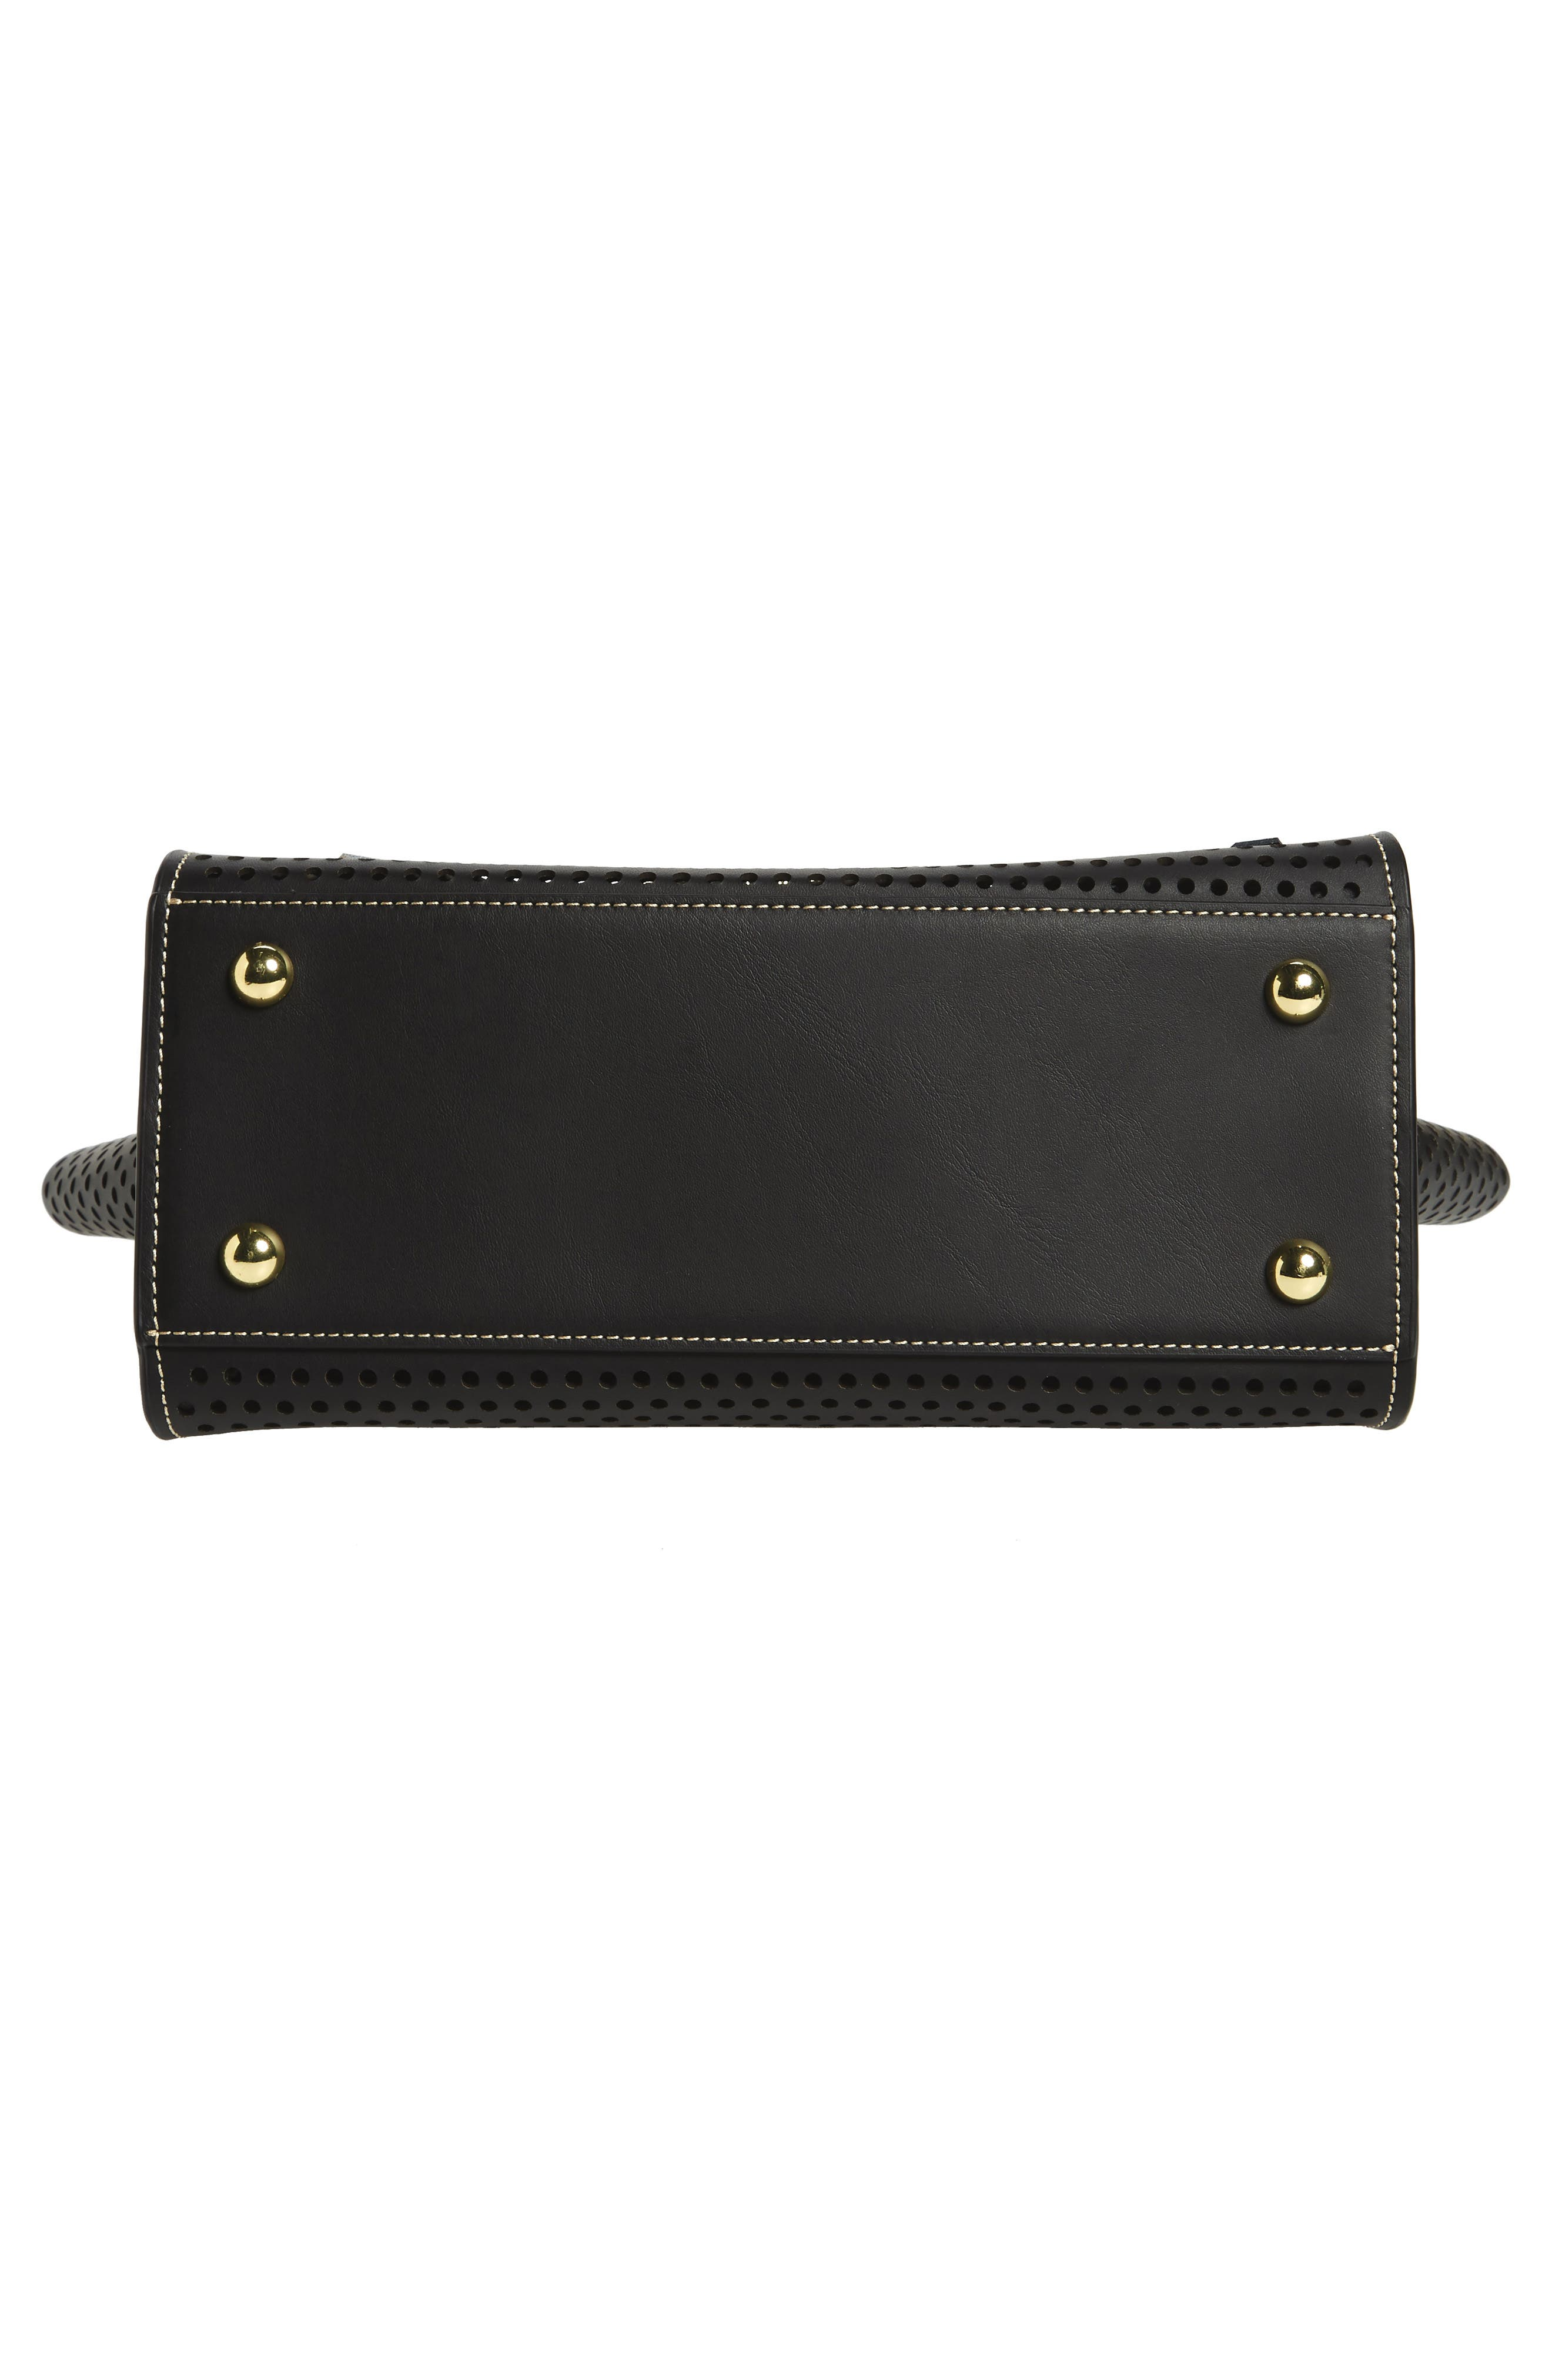 Eartha Kit Calfskin Leather Top Handle Satchel,                             Alternate thumbnail 11, color,